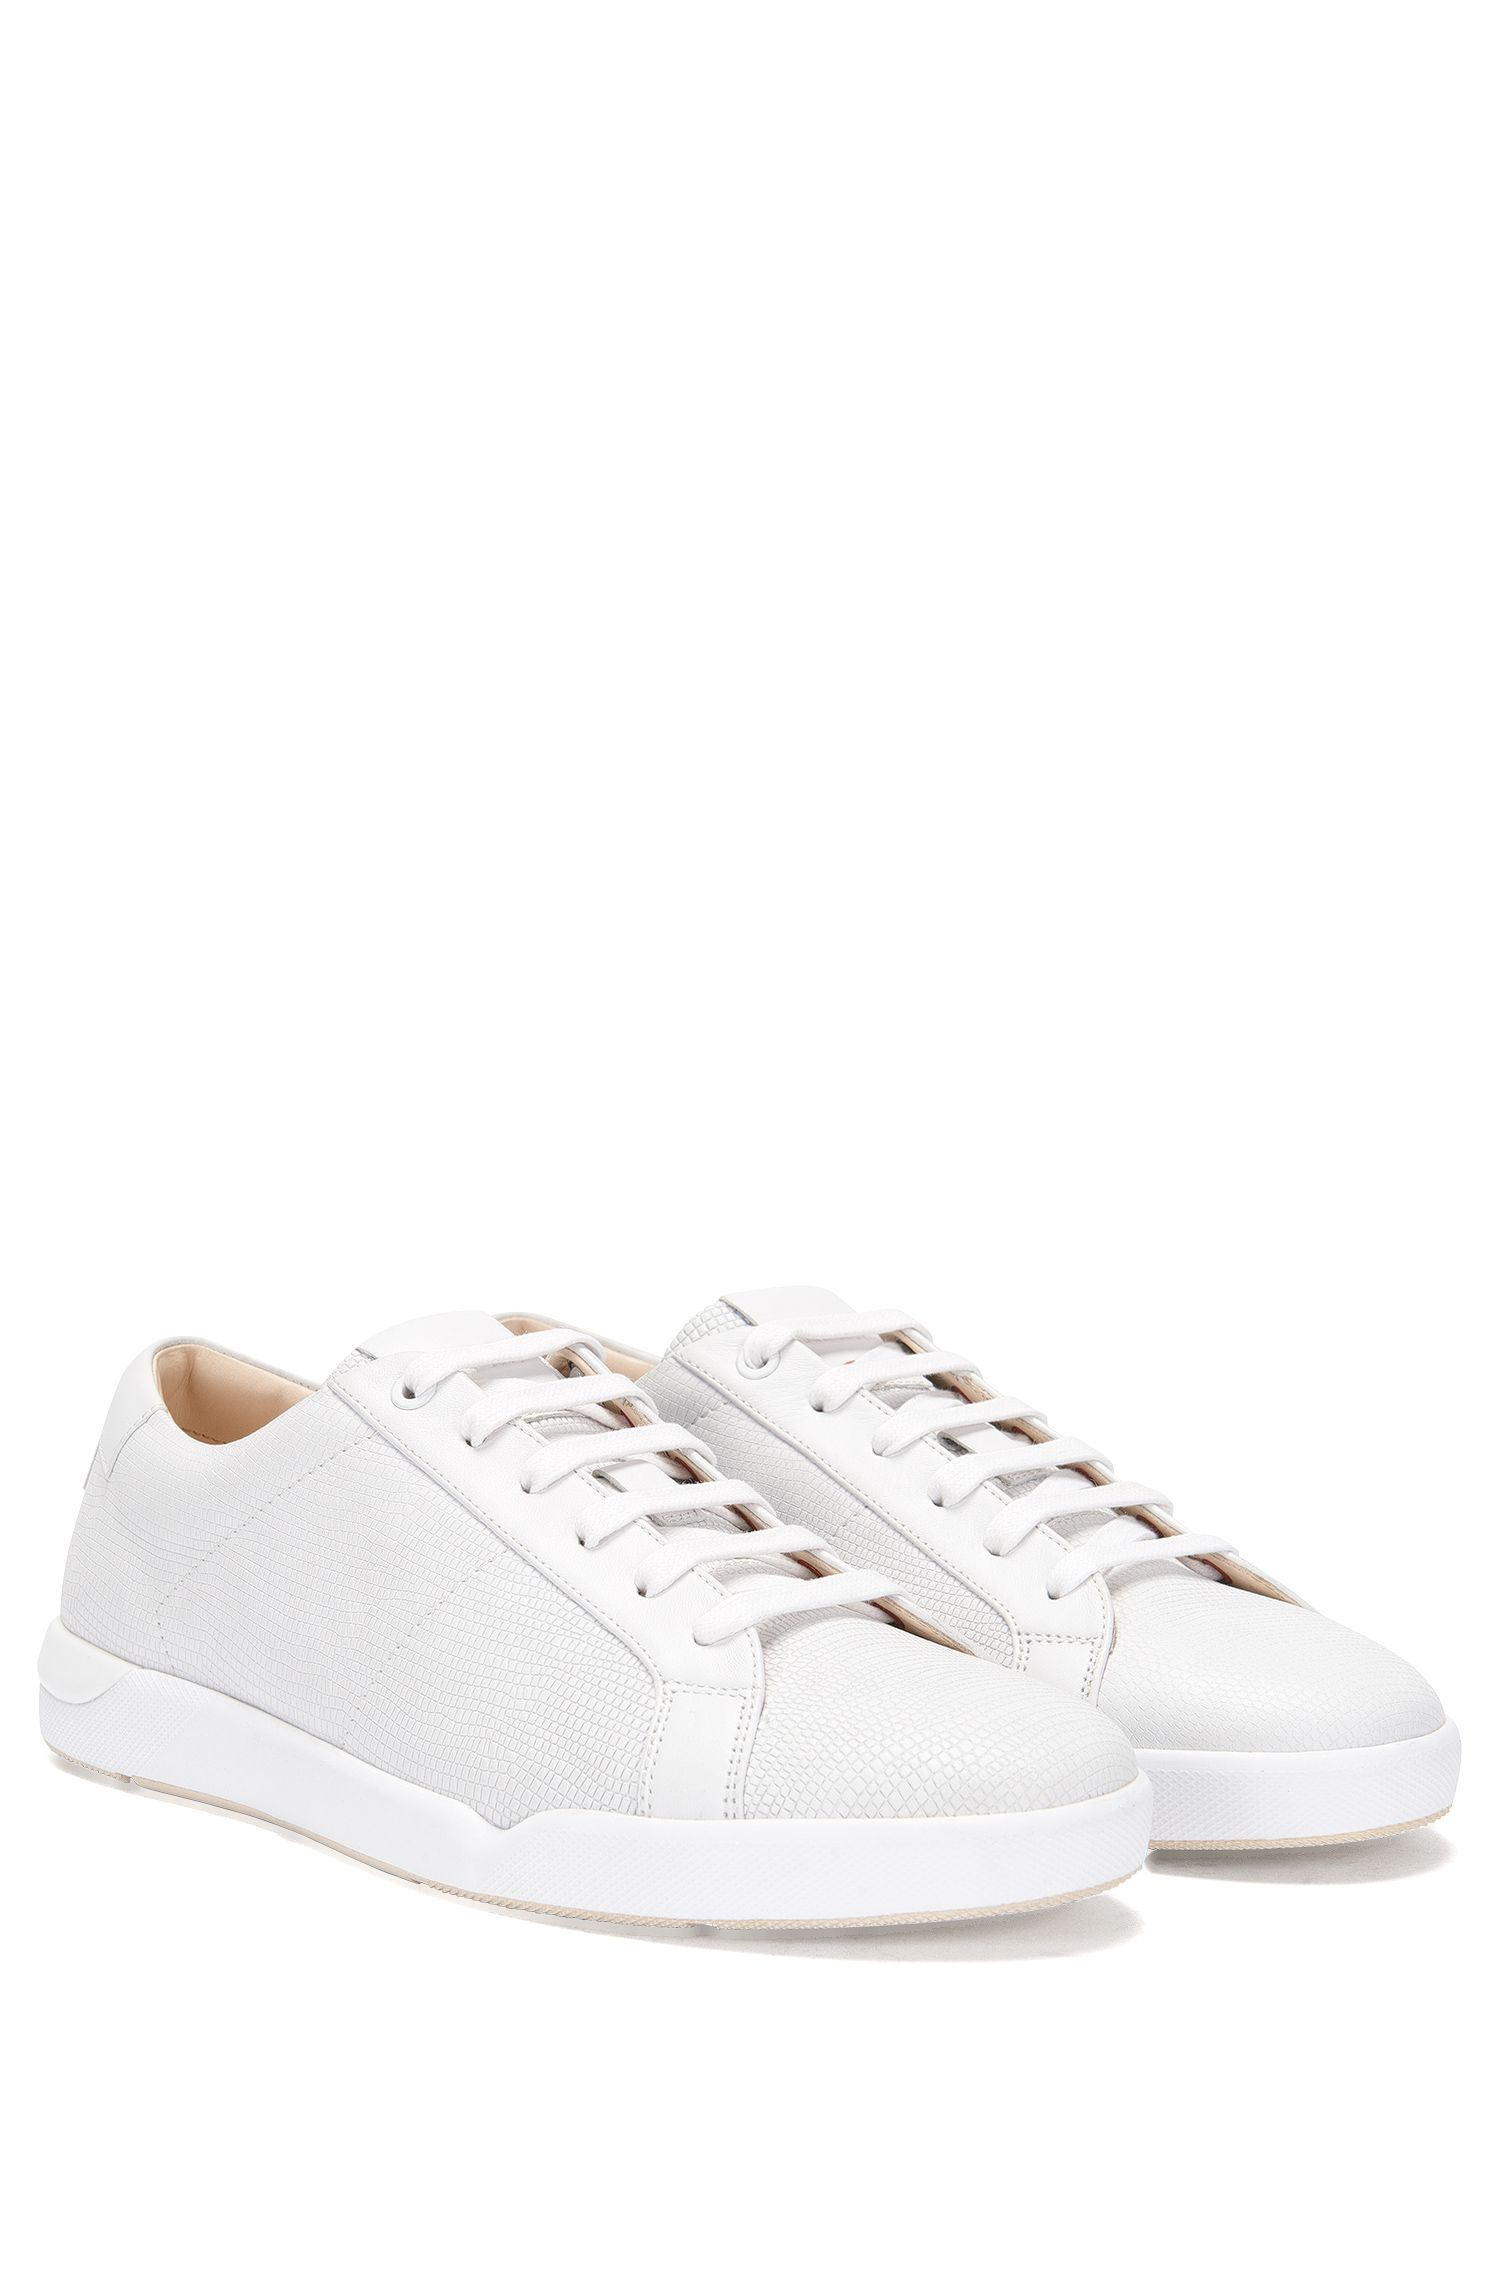 Sneakers aus Leder mit Allover-Prägung: 'Fusion_Tenn_Itexo'